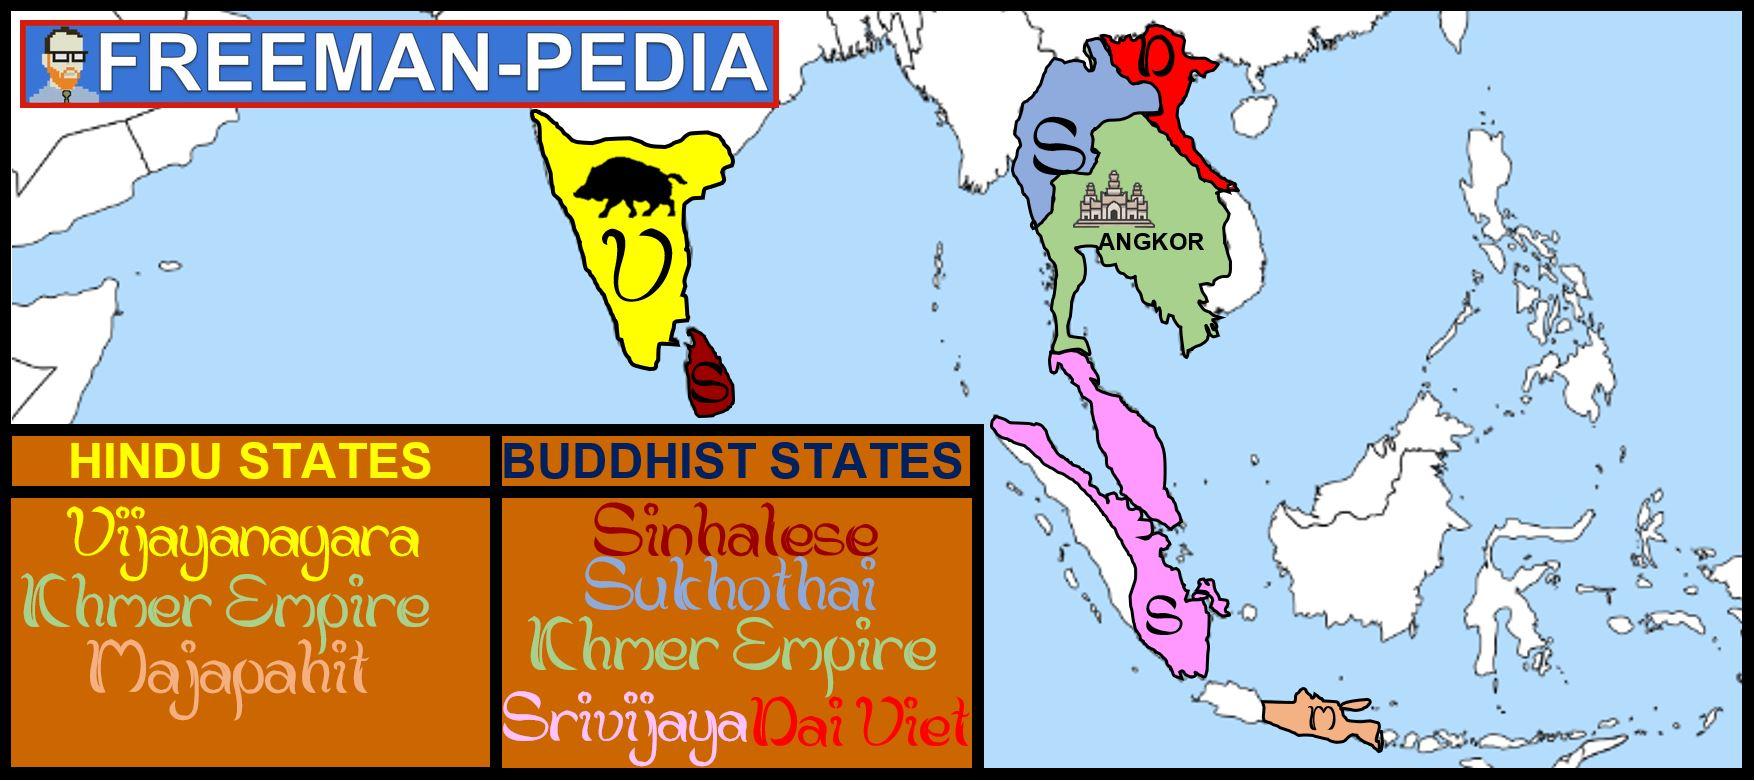 hindu buddhist states south asia southeast ap world modern freemanpedia.JPG